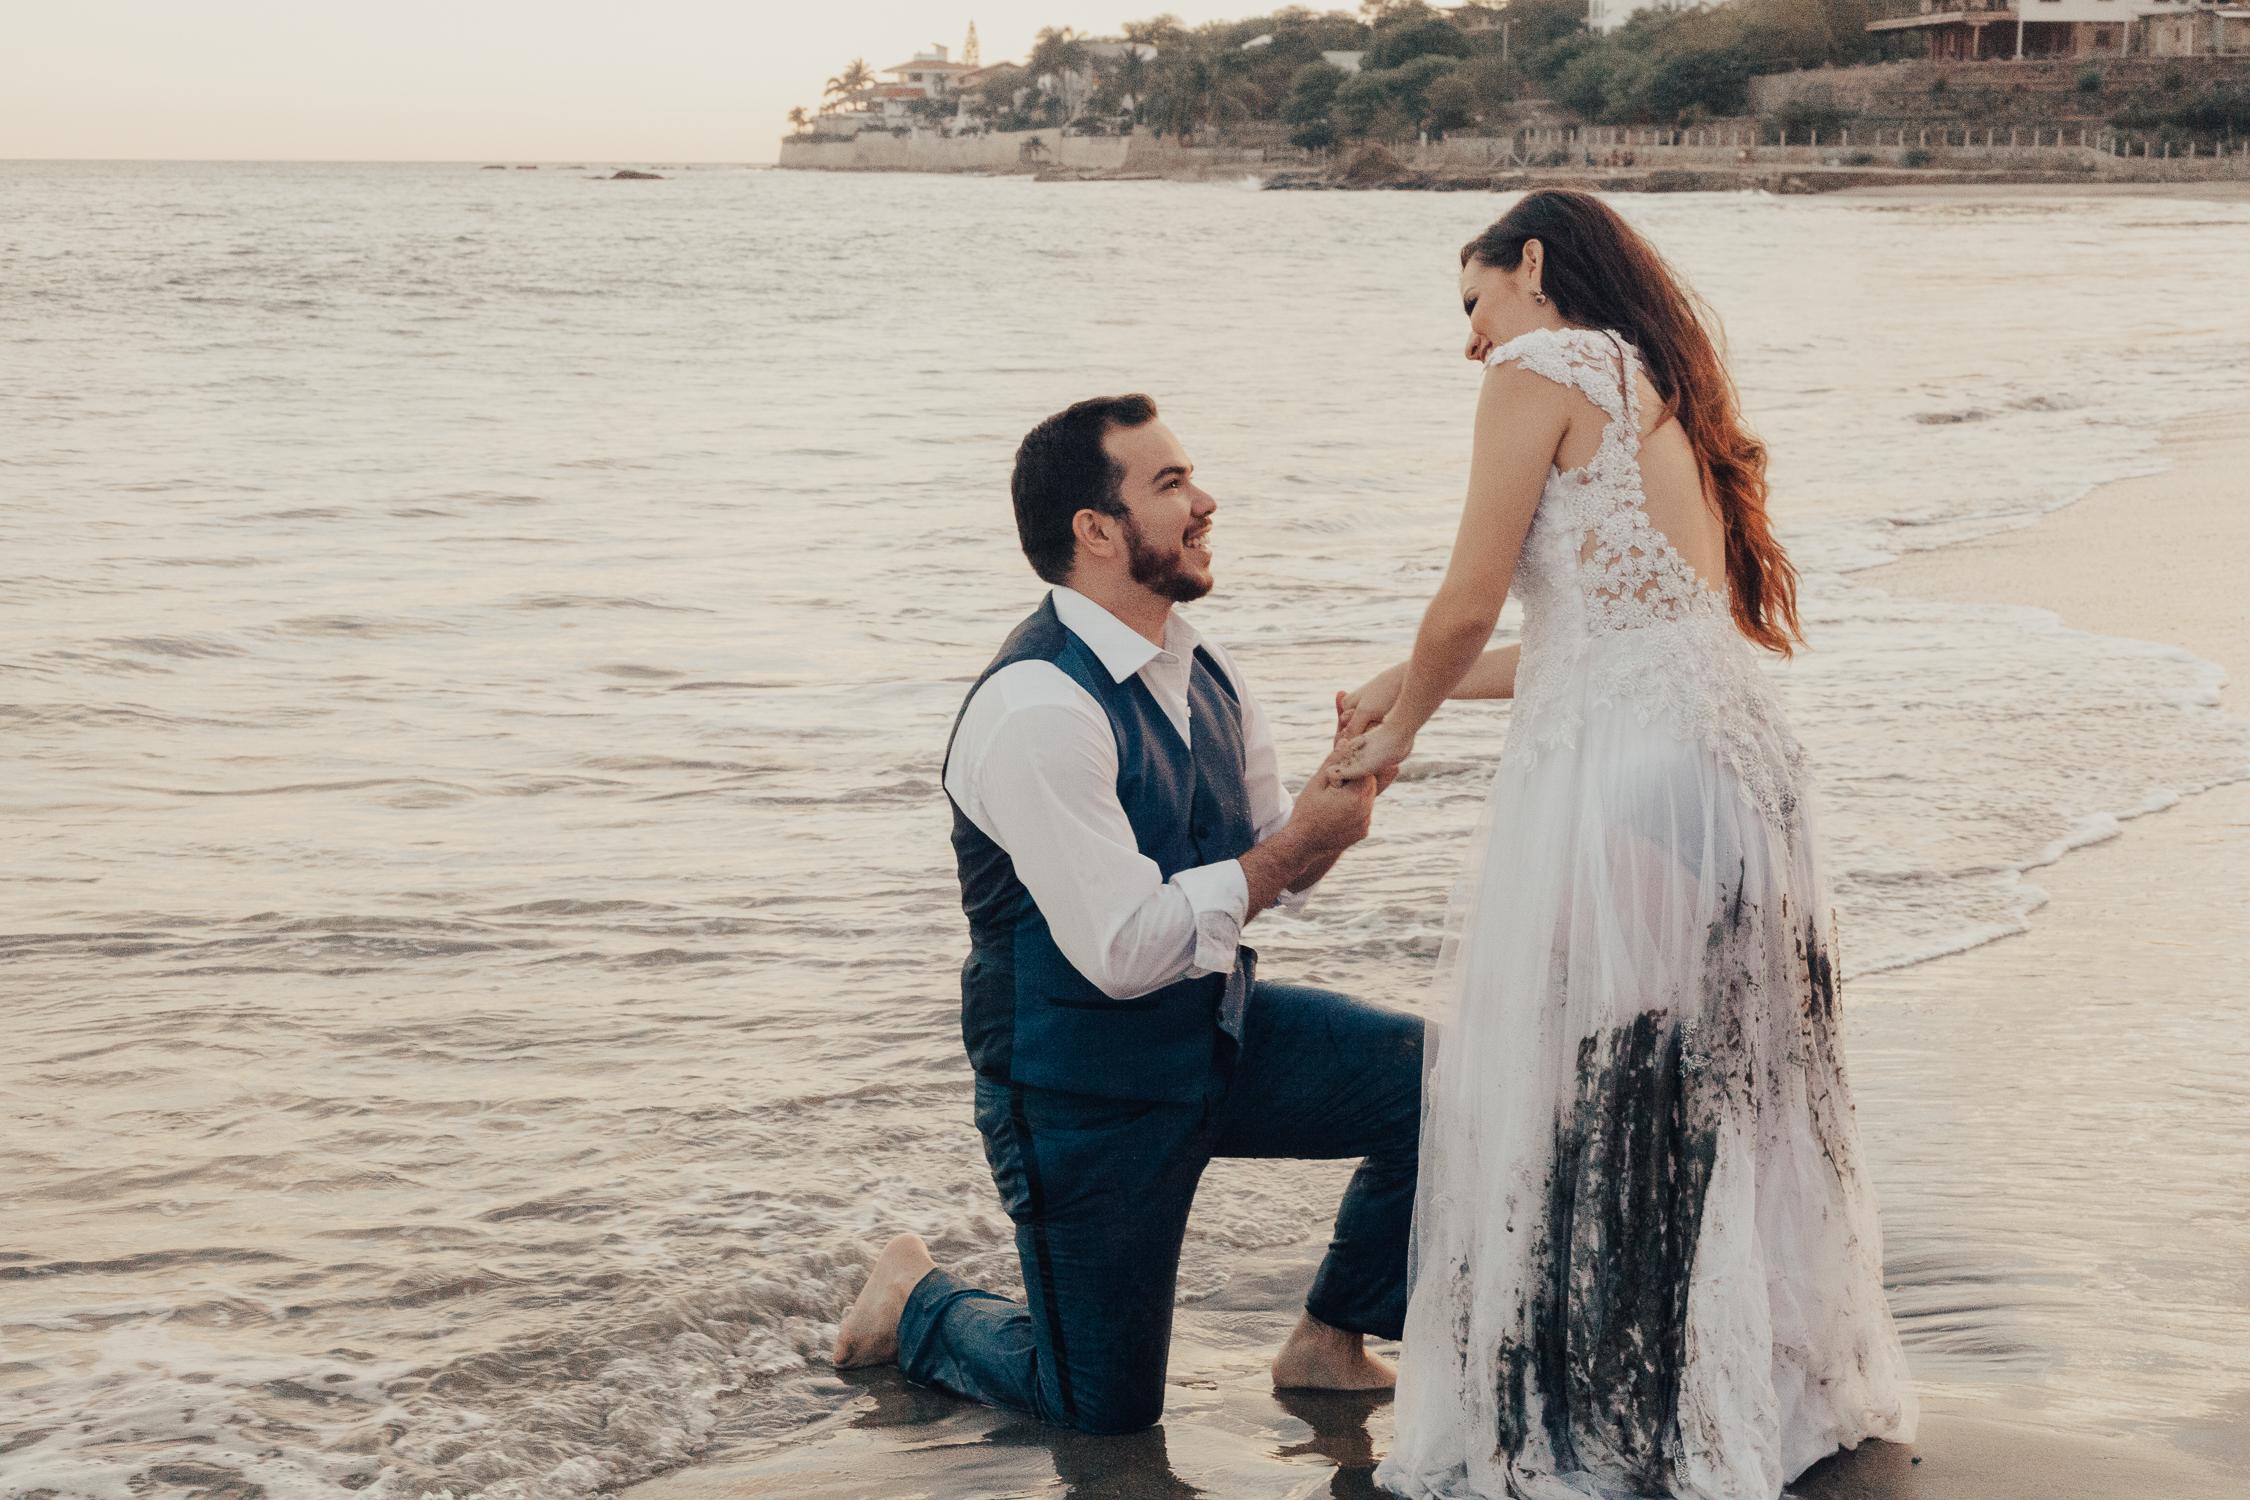 Michelle-Agurto-Fotografia-Bodas-Ecuador-Destination-Wedding-Photographer-Gabriela-Gabriel-20.JPG